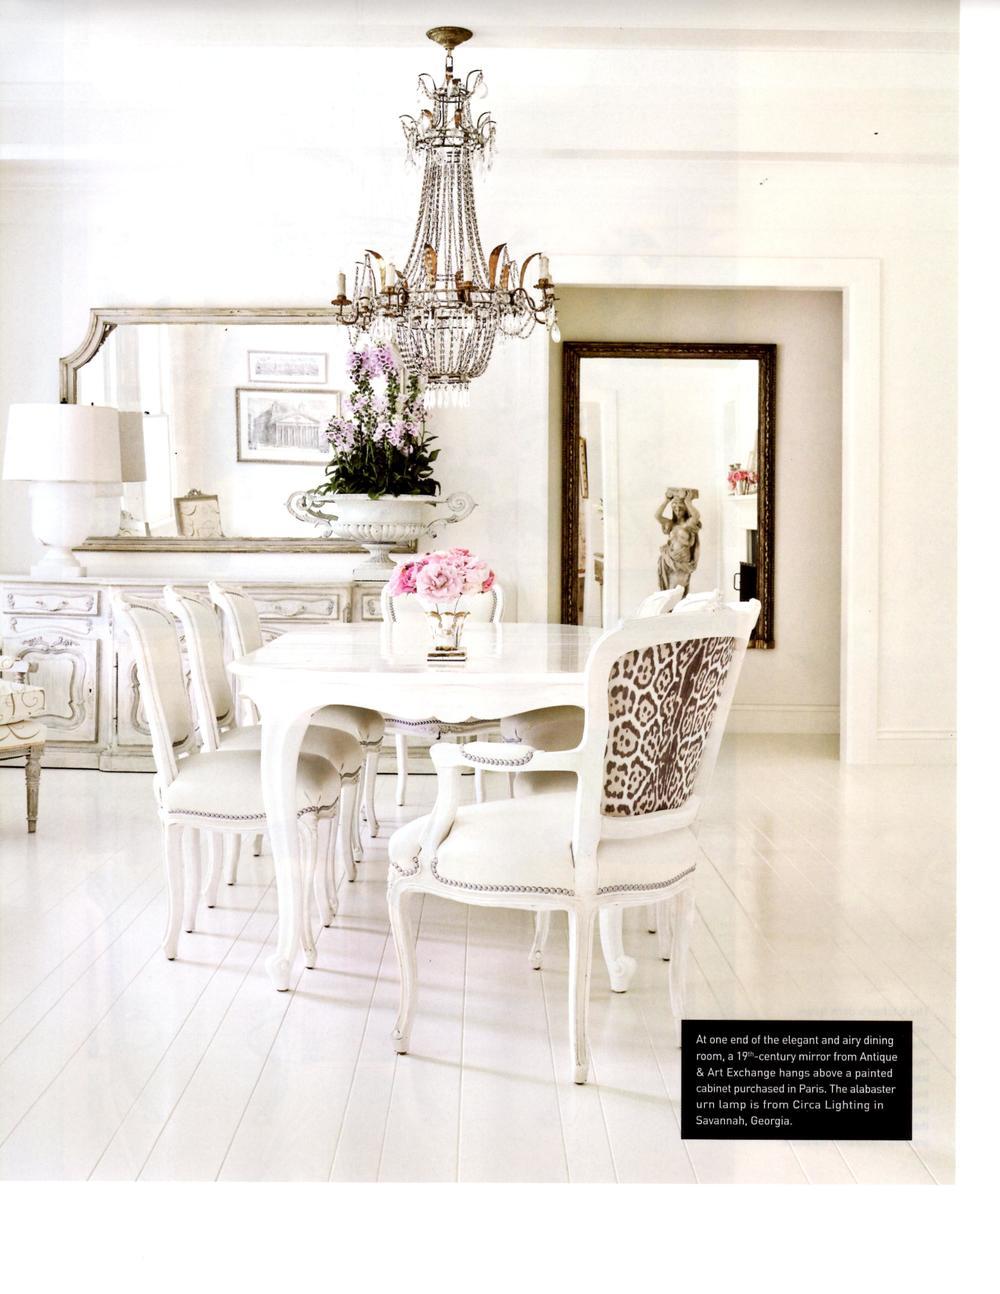 myrahoeferdesign_luxe_magazine_7.jpg